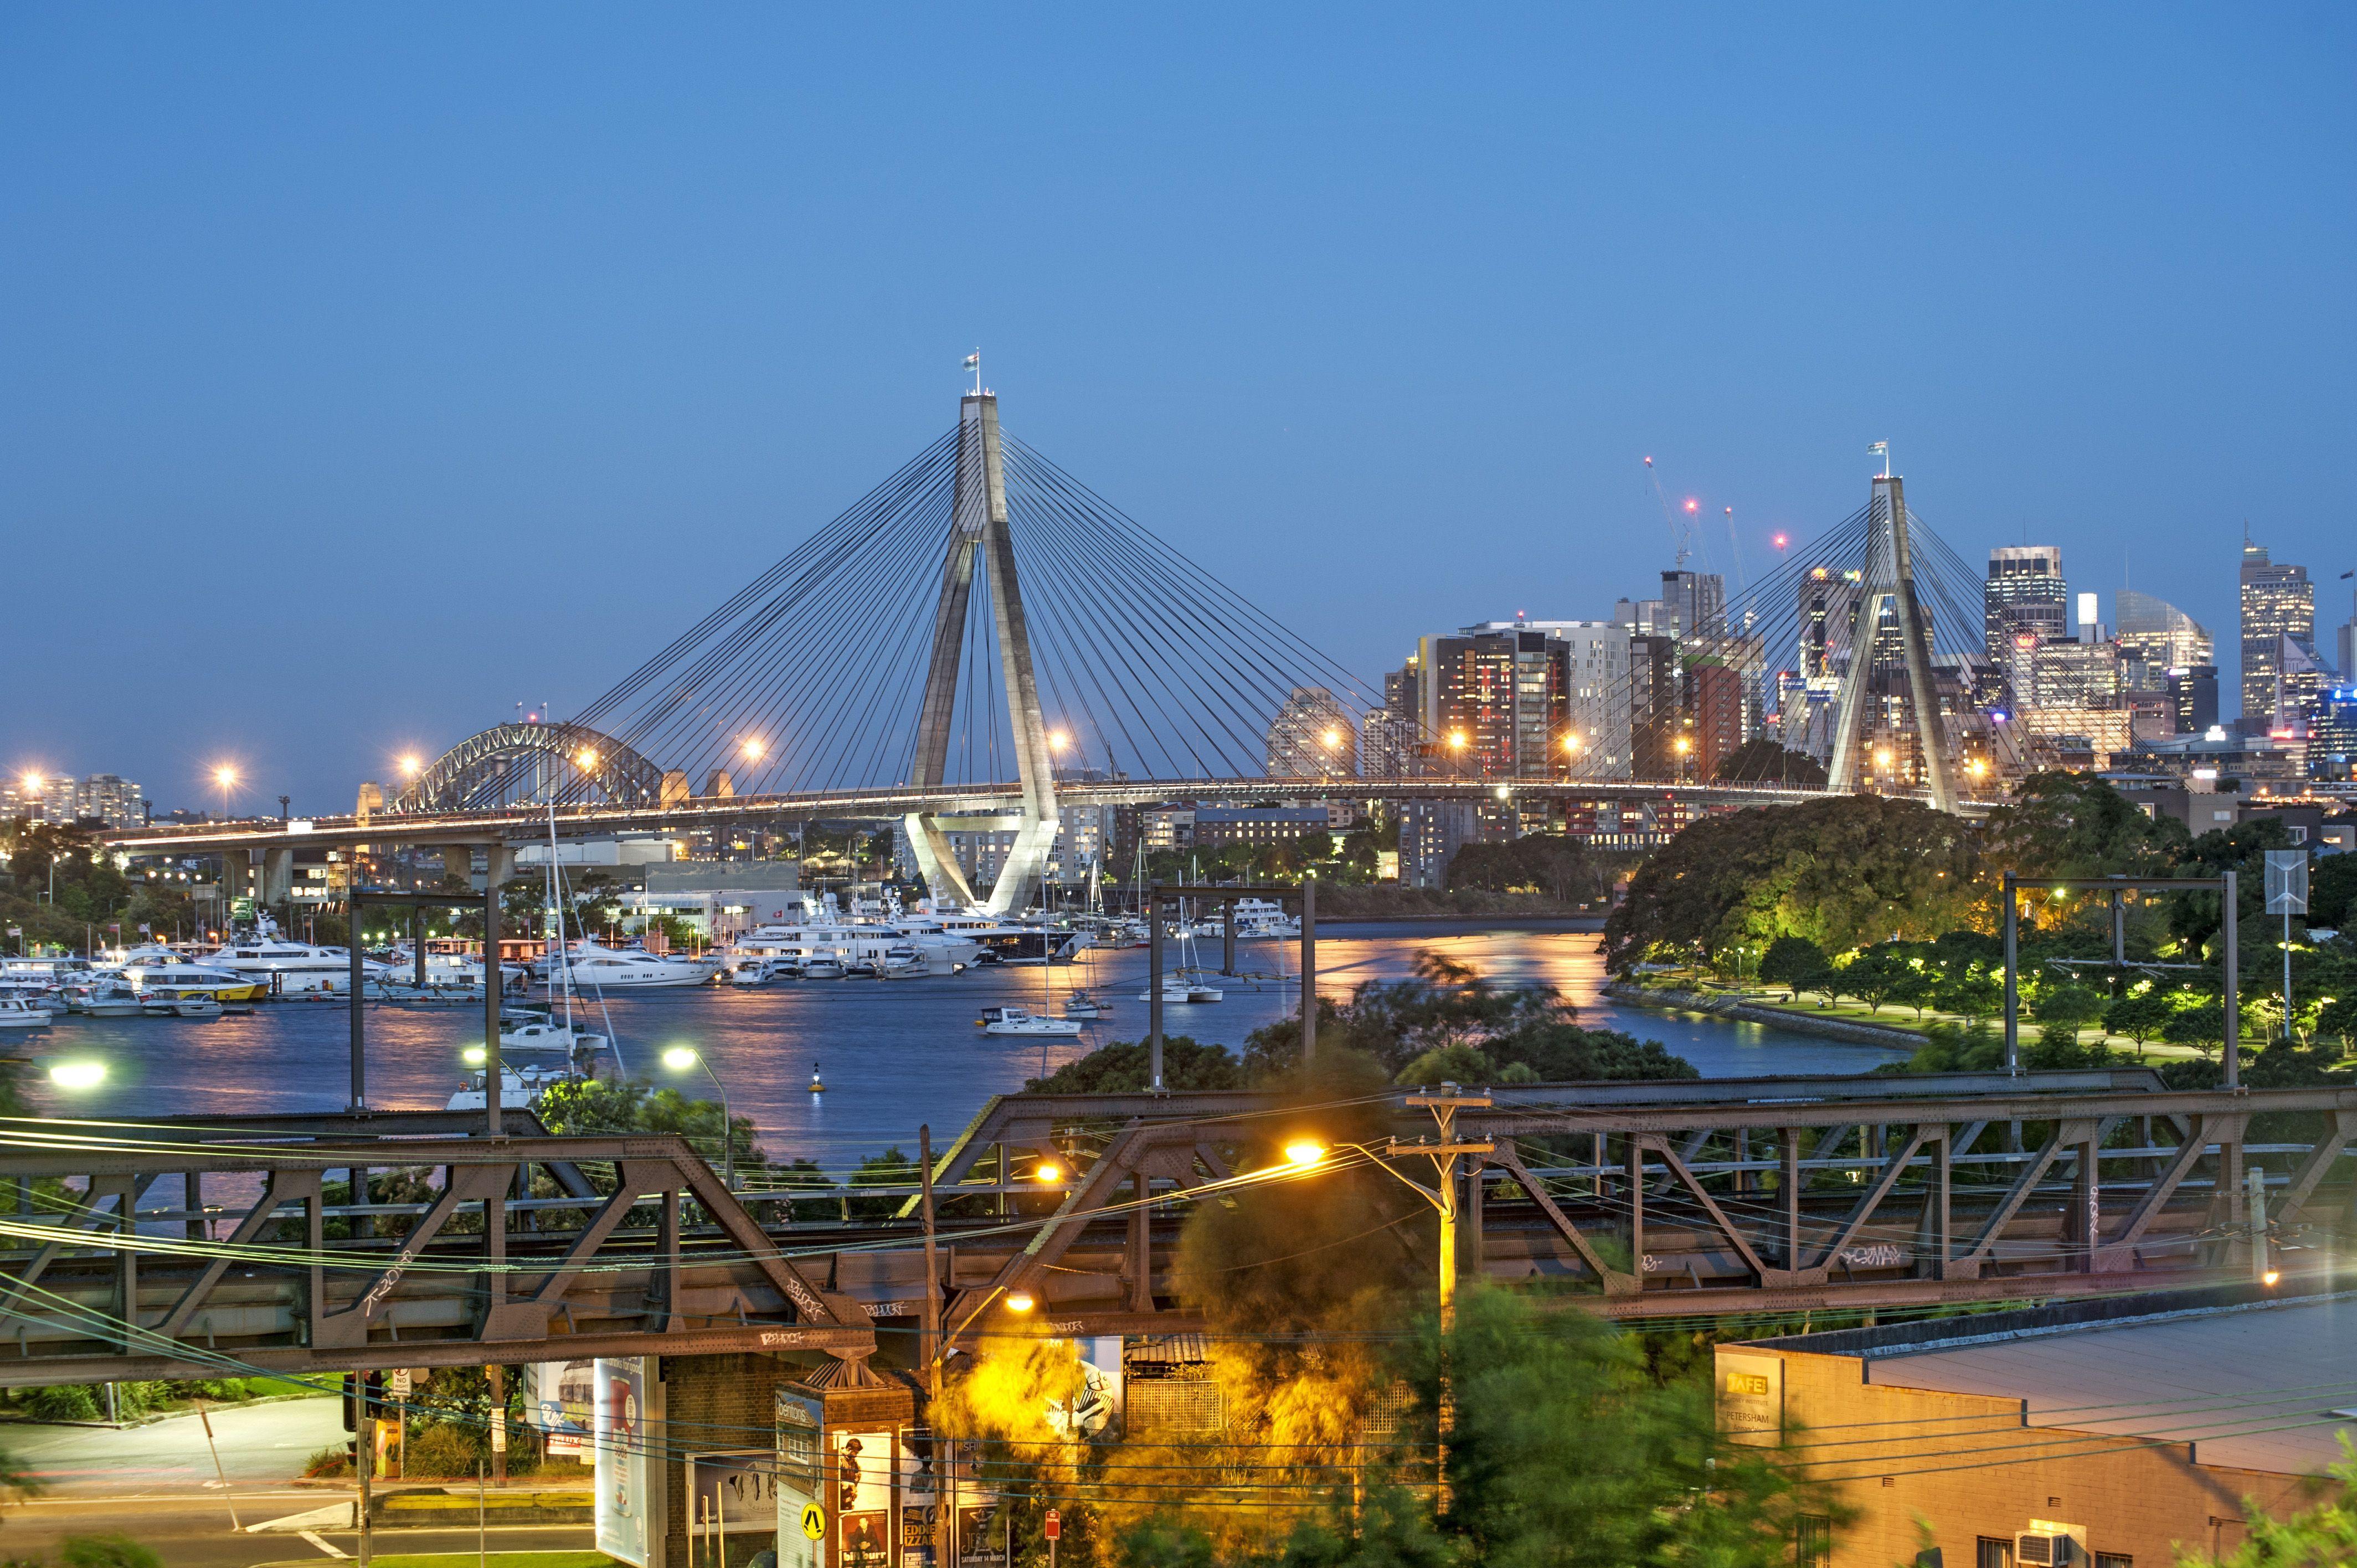 This view of the Anzac Bridge, Sydney Harbour Bridge and the city ...